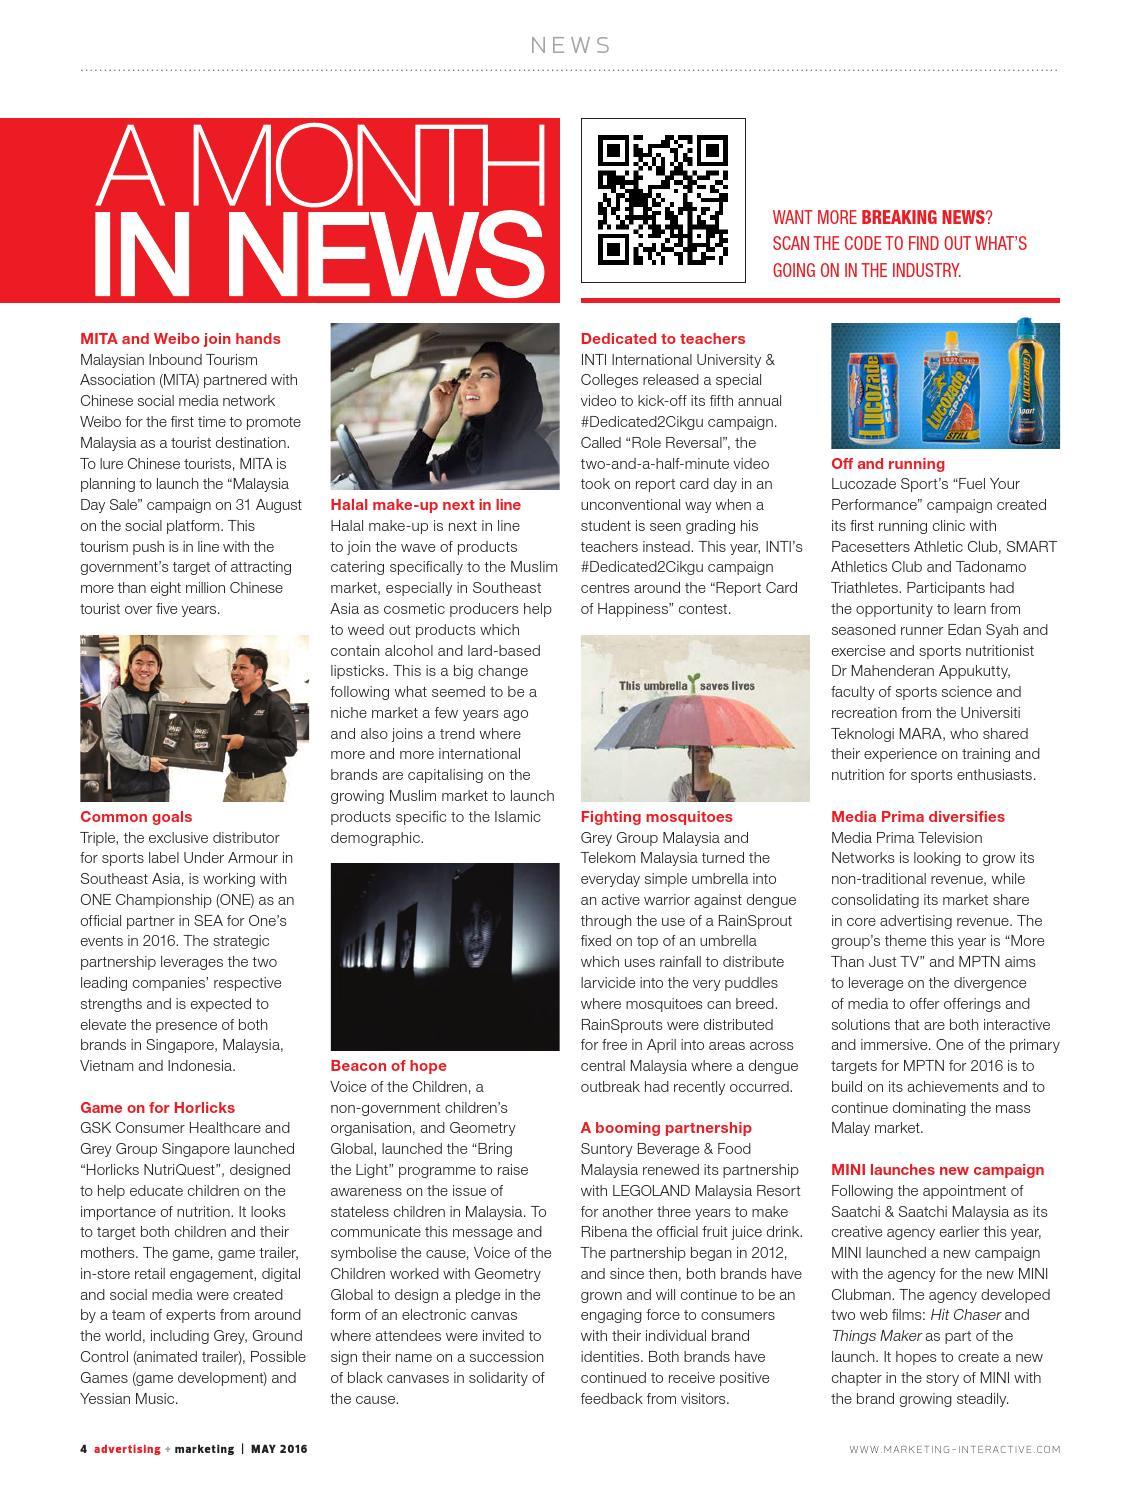 Advertising + Marketing MY - May 2016 by Marketing Magazine